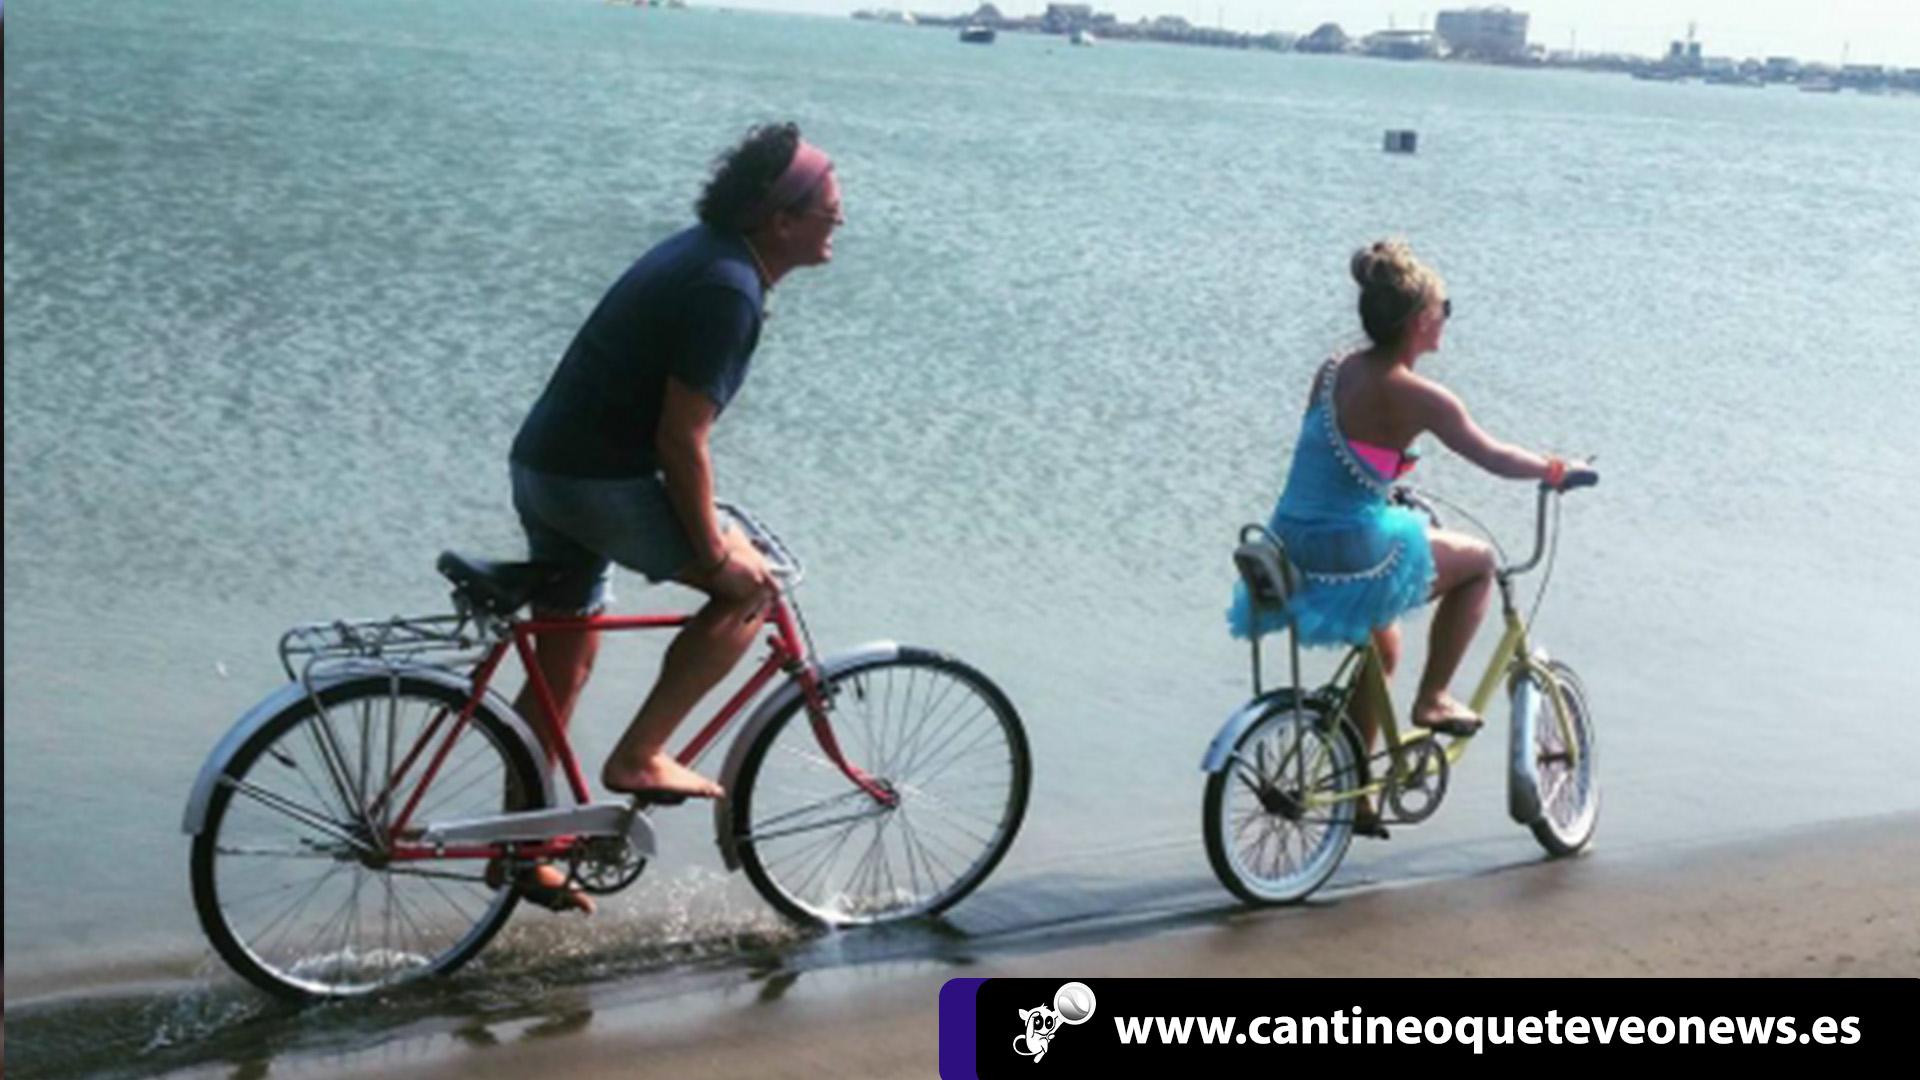 shakira la bicicleta - cantineoqueteveonews